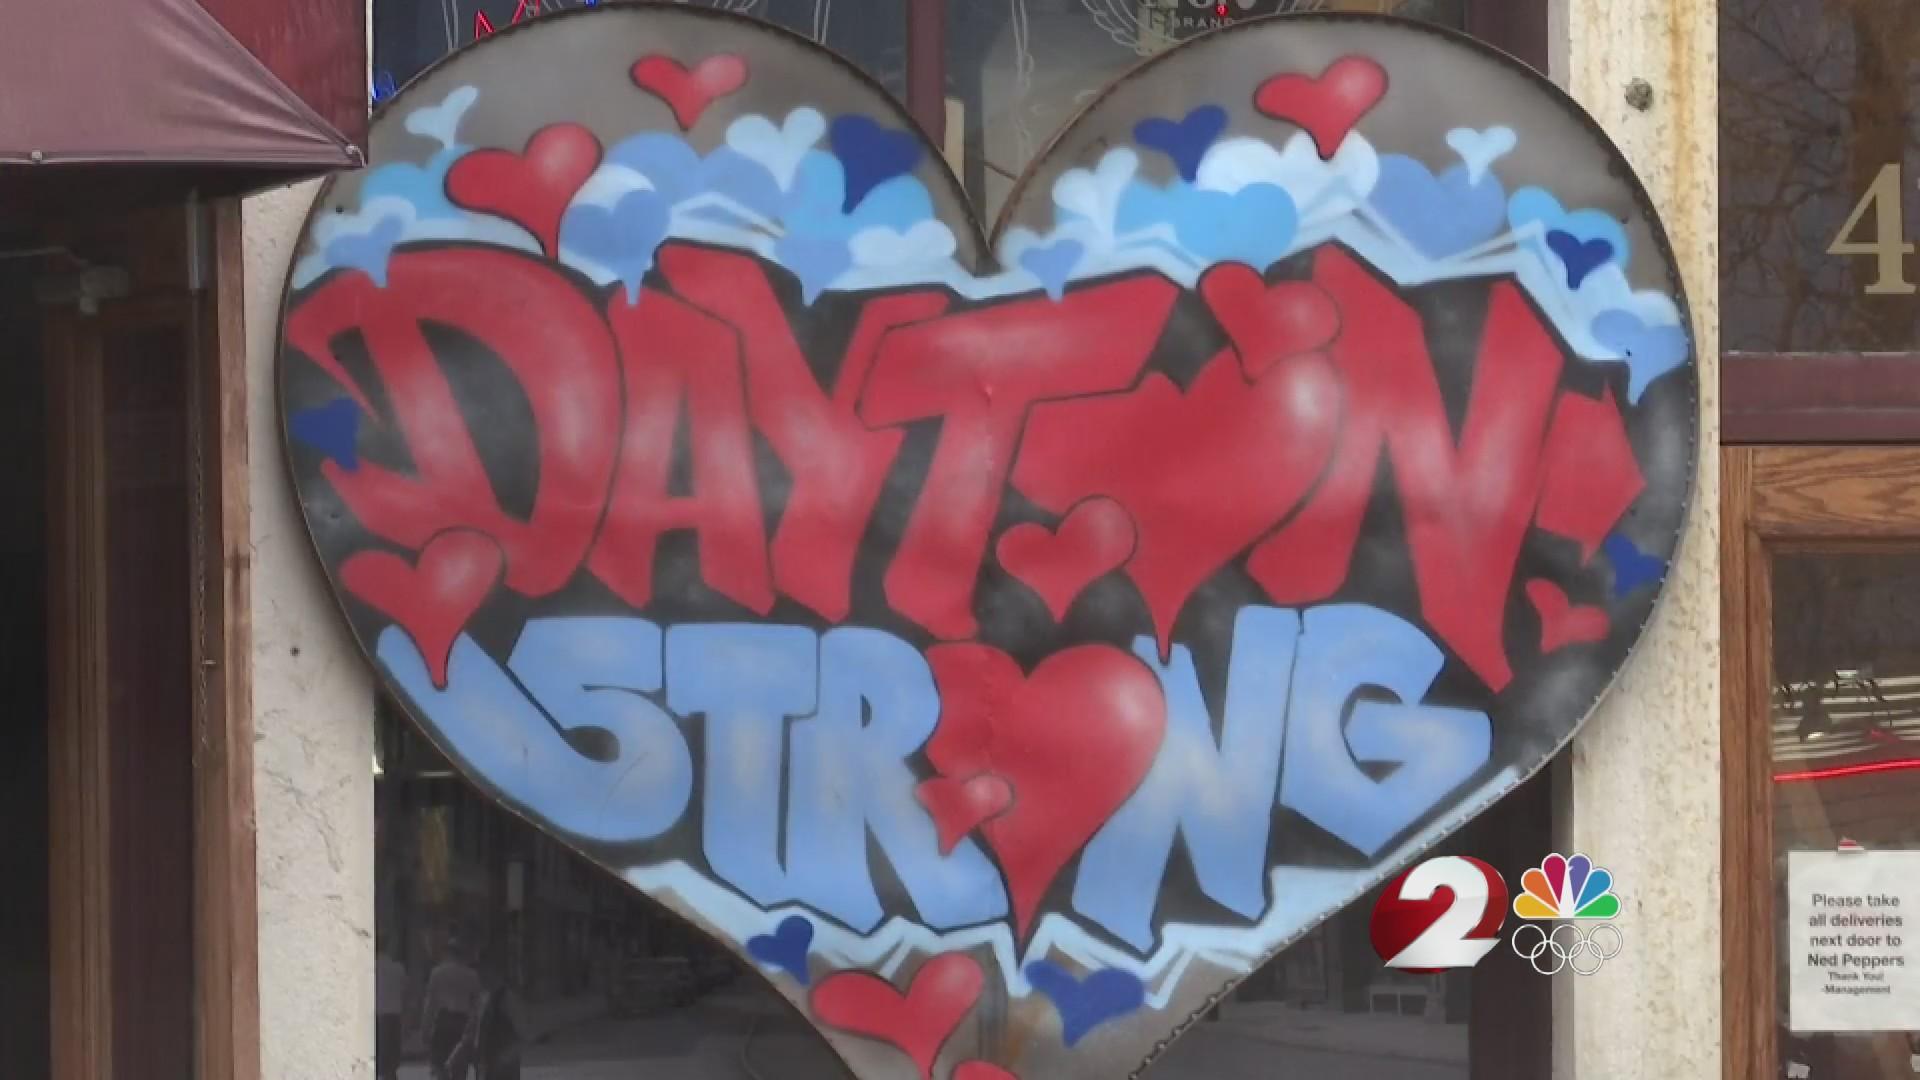 Dayton Strong, Oregon District shooting